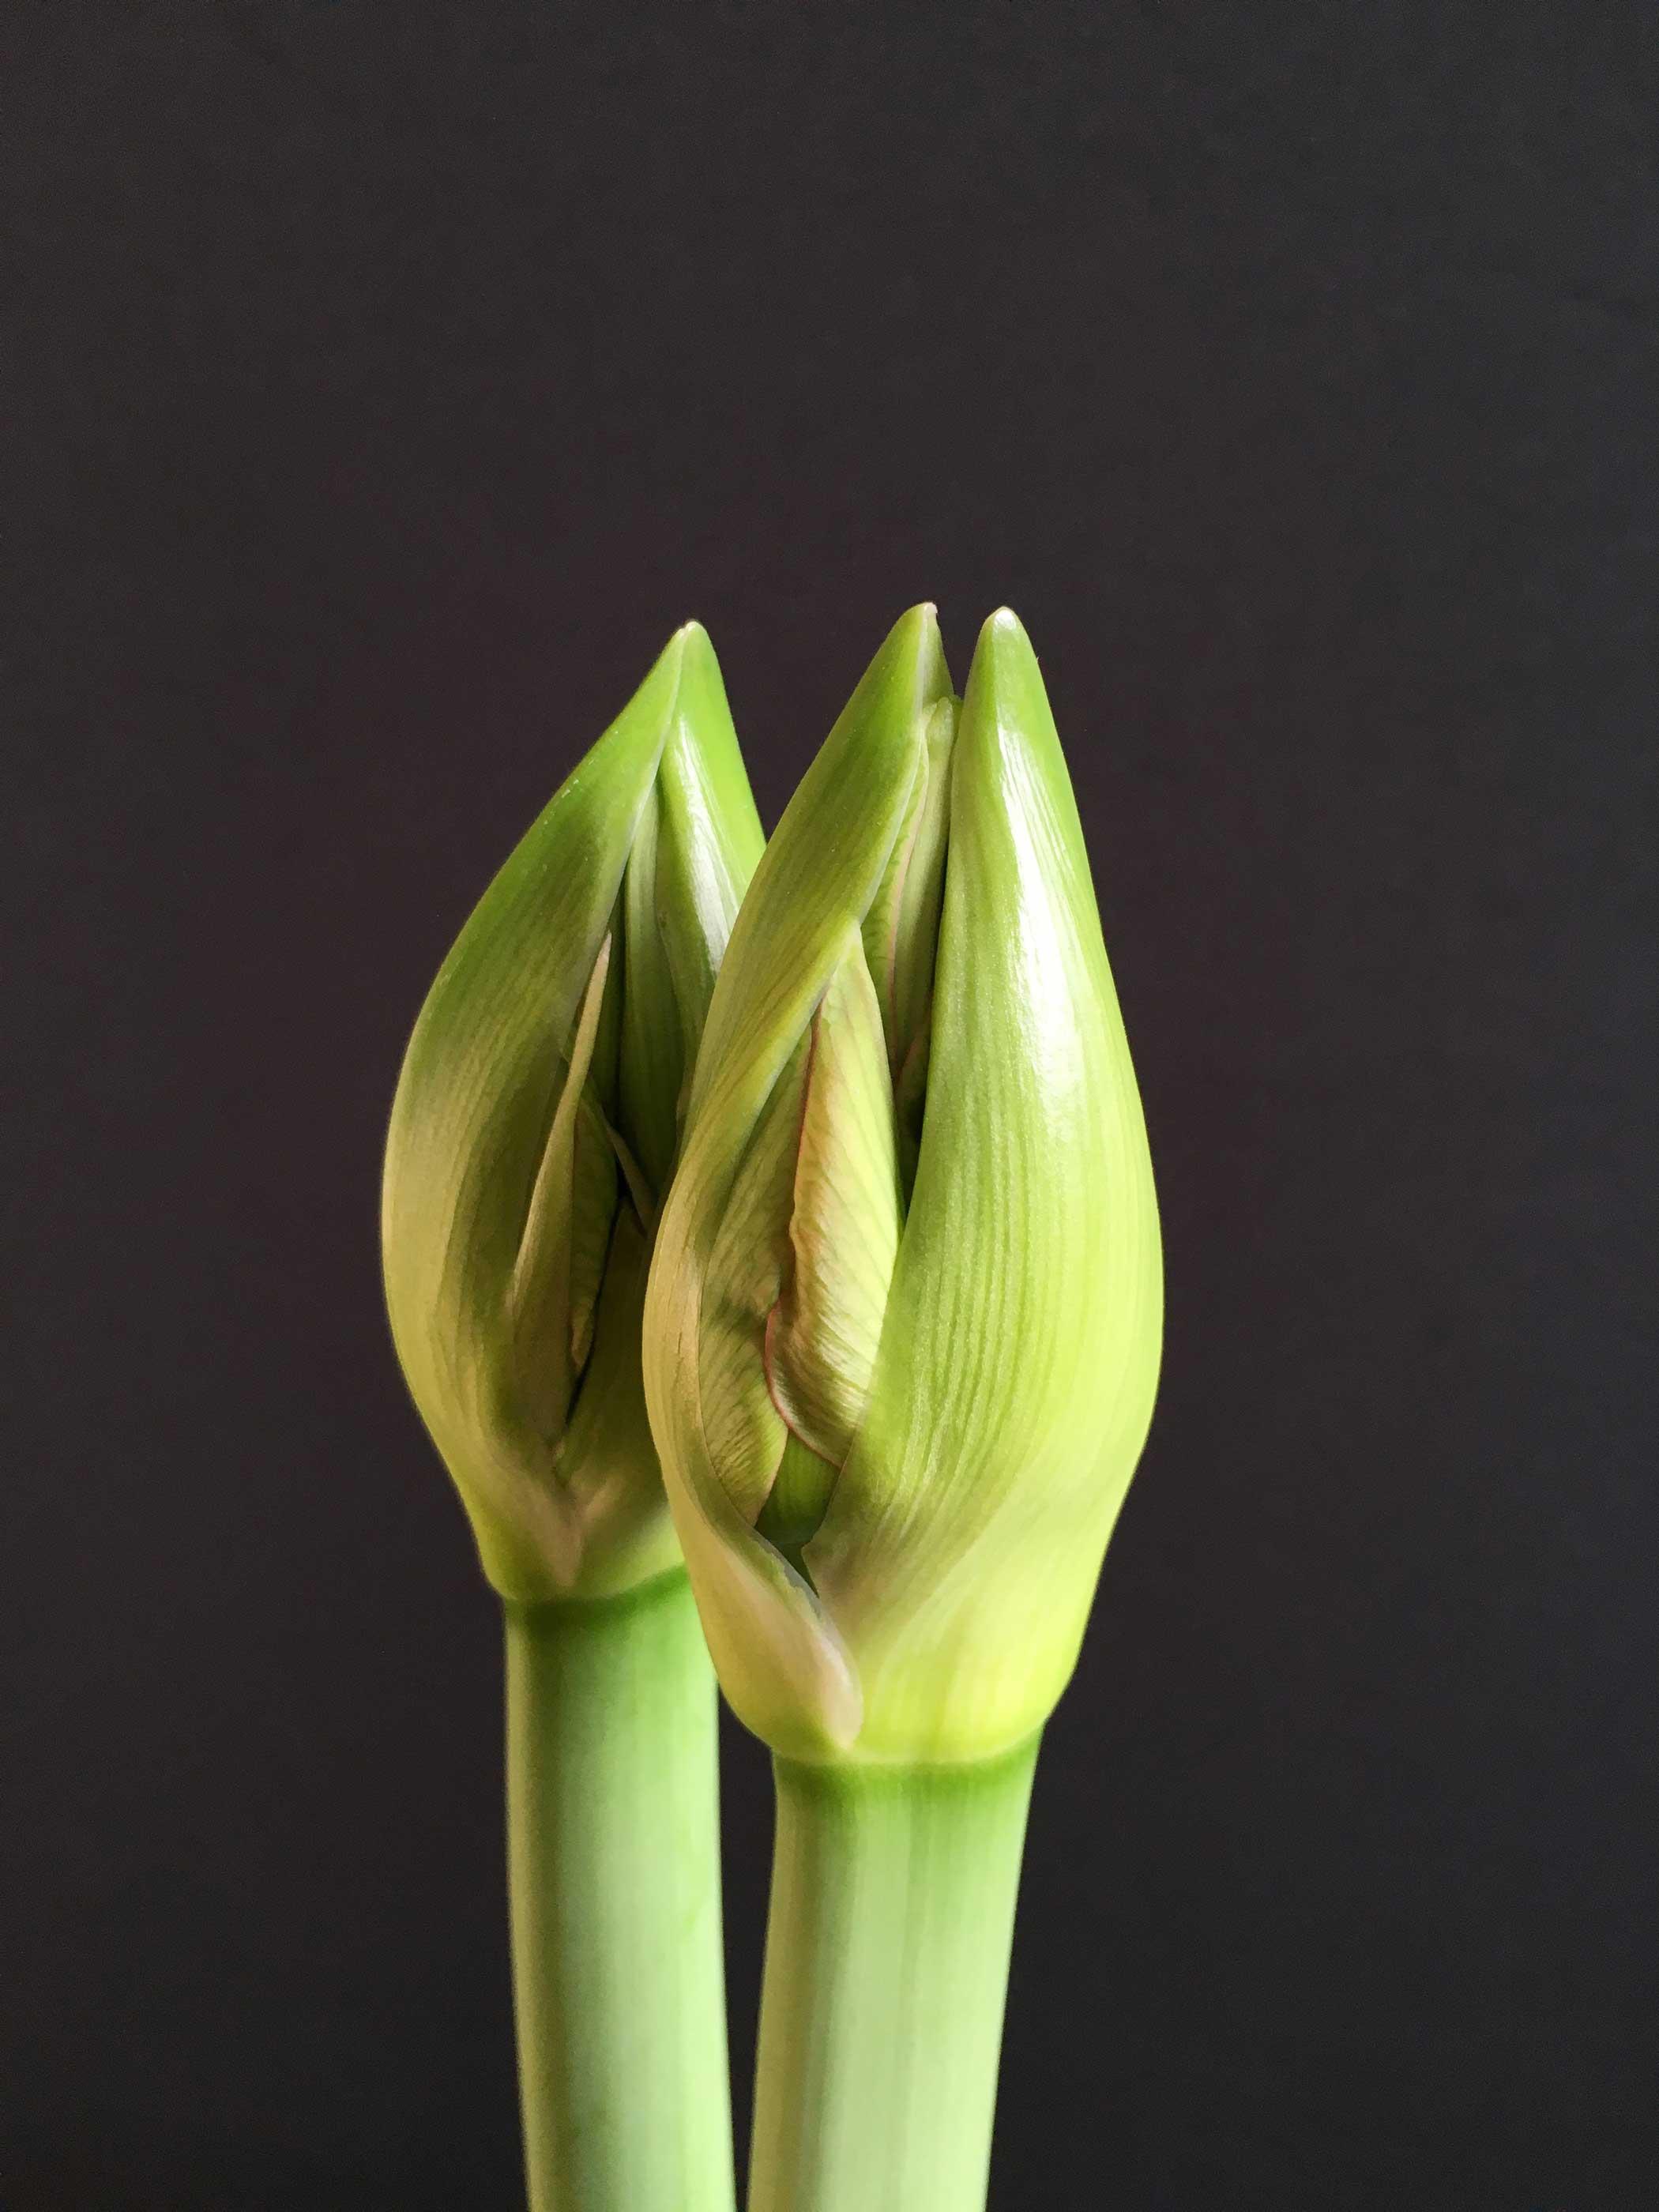 Amaryllis-Beauty-of-the-Bud-Longfield-Gardens3.jpg